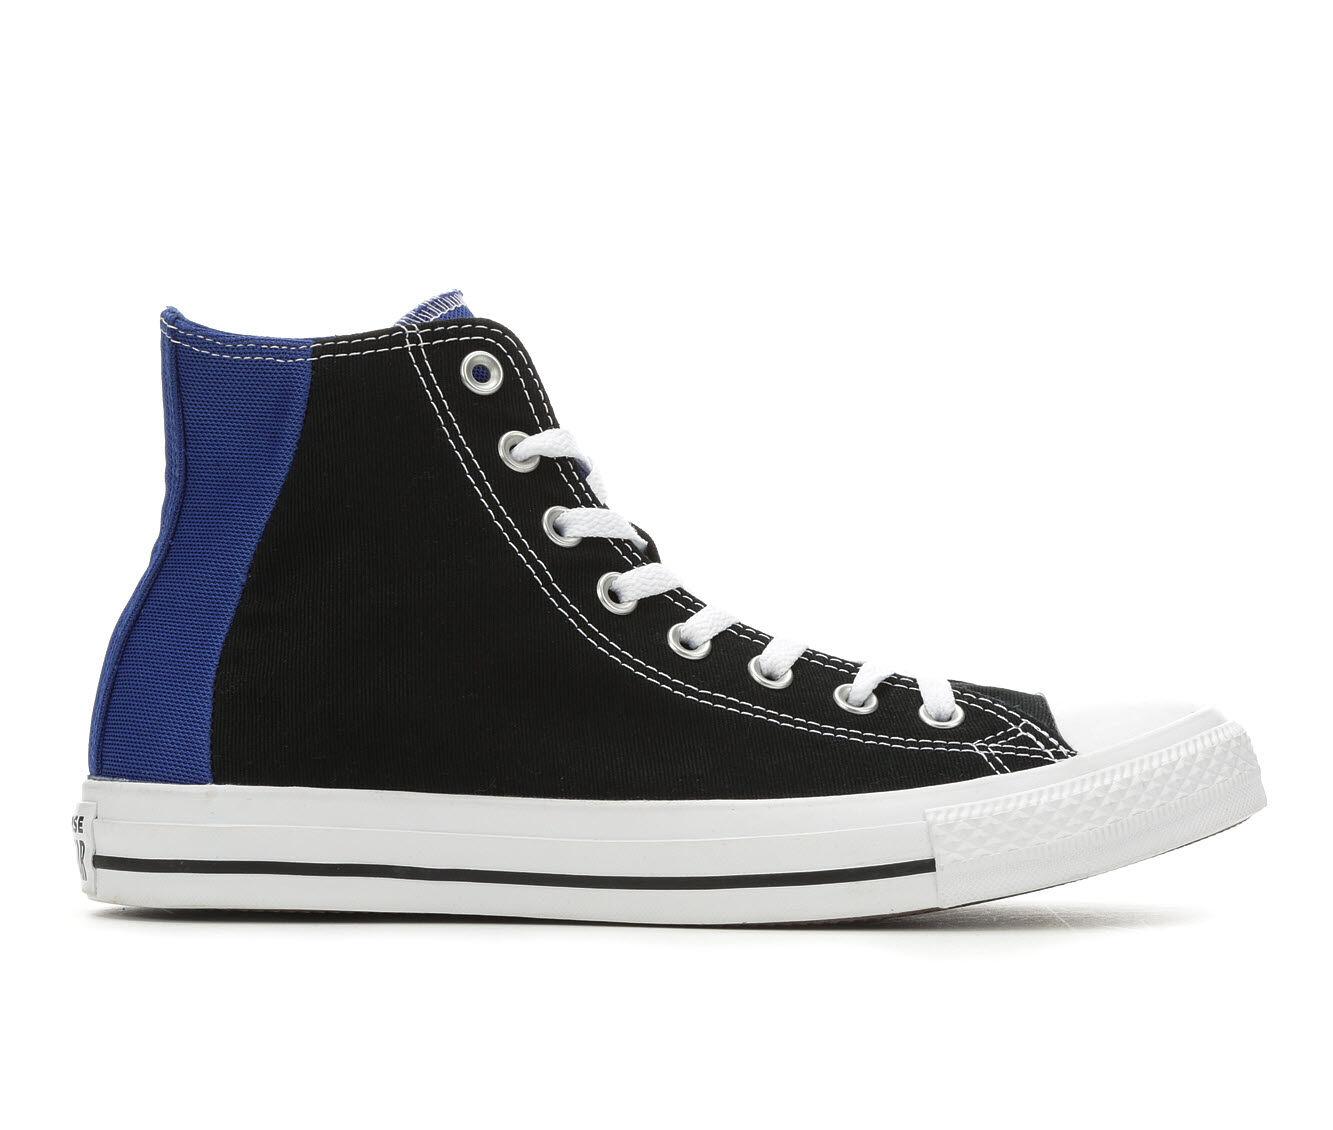 Lowest Price Men's Converse CTAS Patch Me Through High-Top Sneakers Blk/Blu/Wht